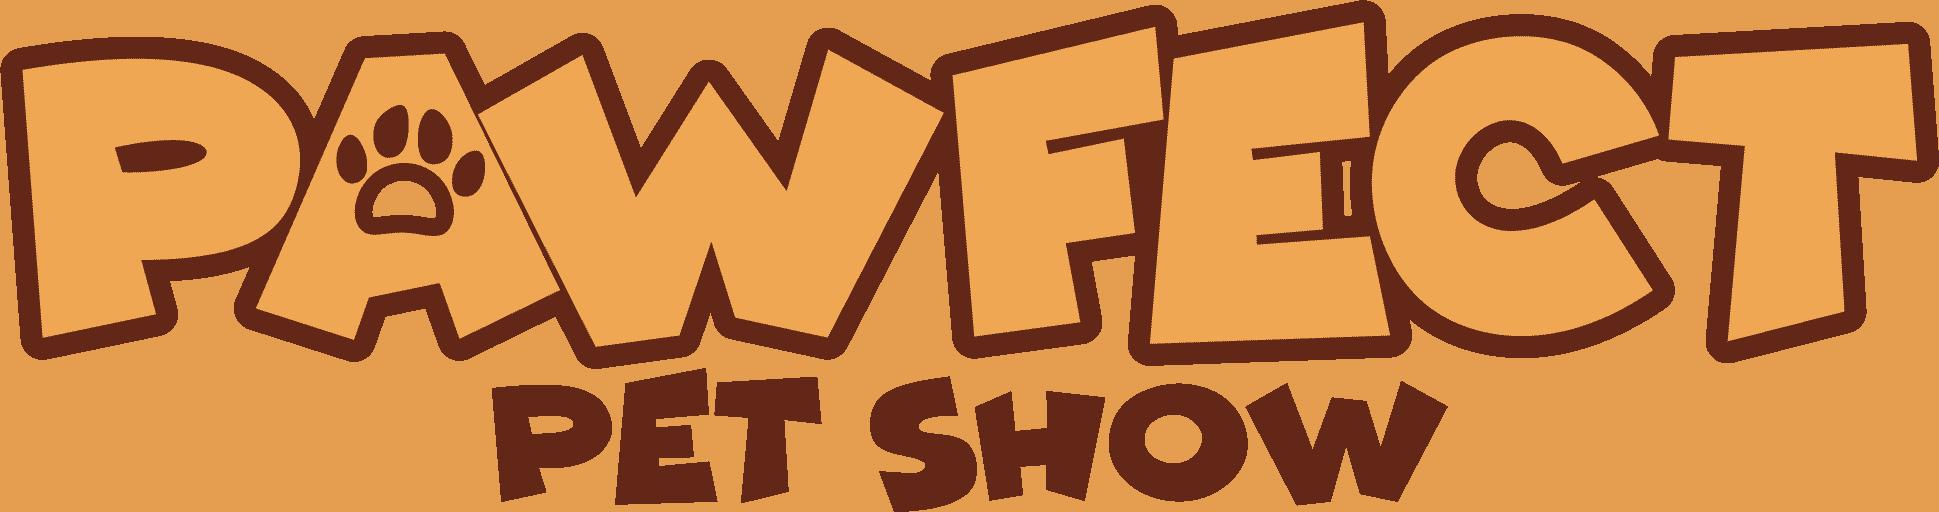 Pawfect Pet Show logo